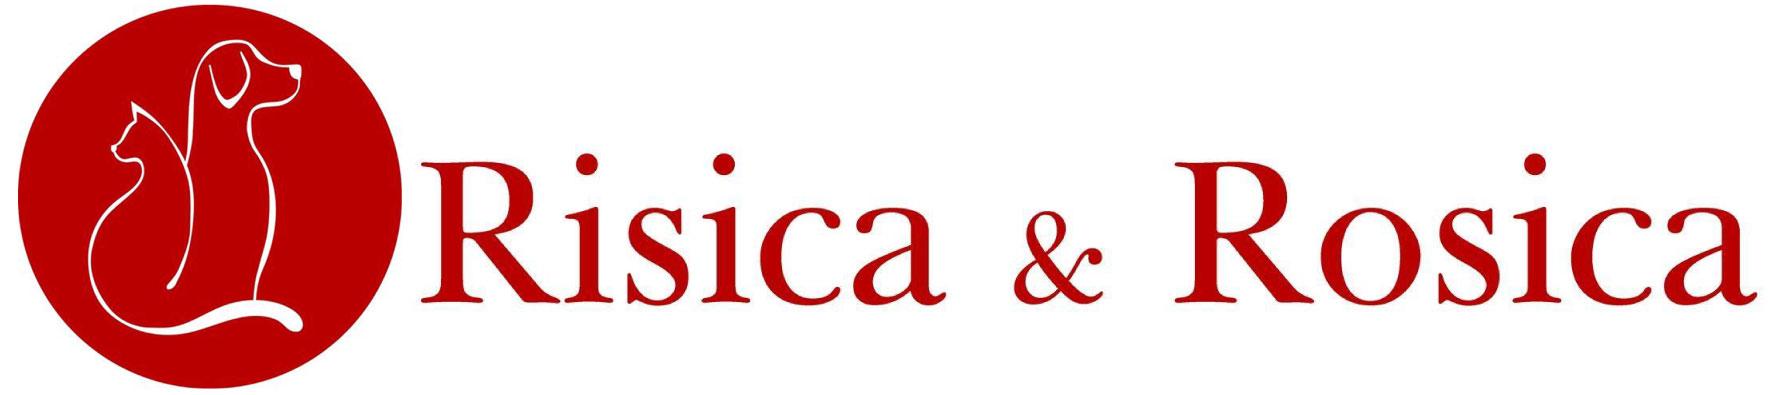 Risica & Rosica